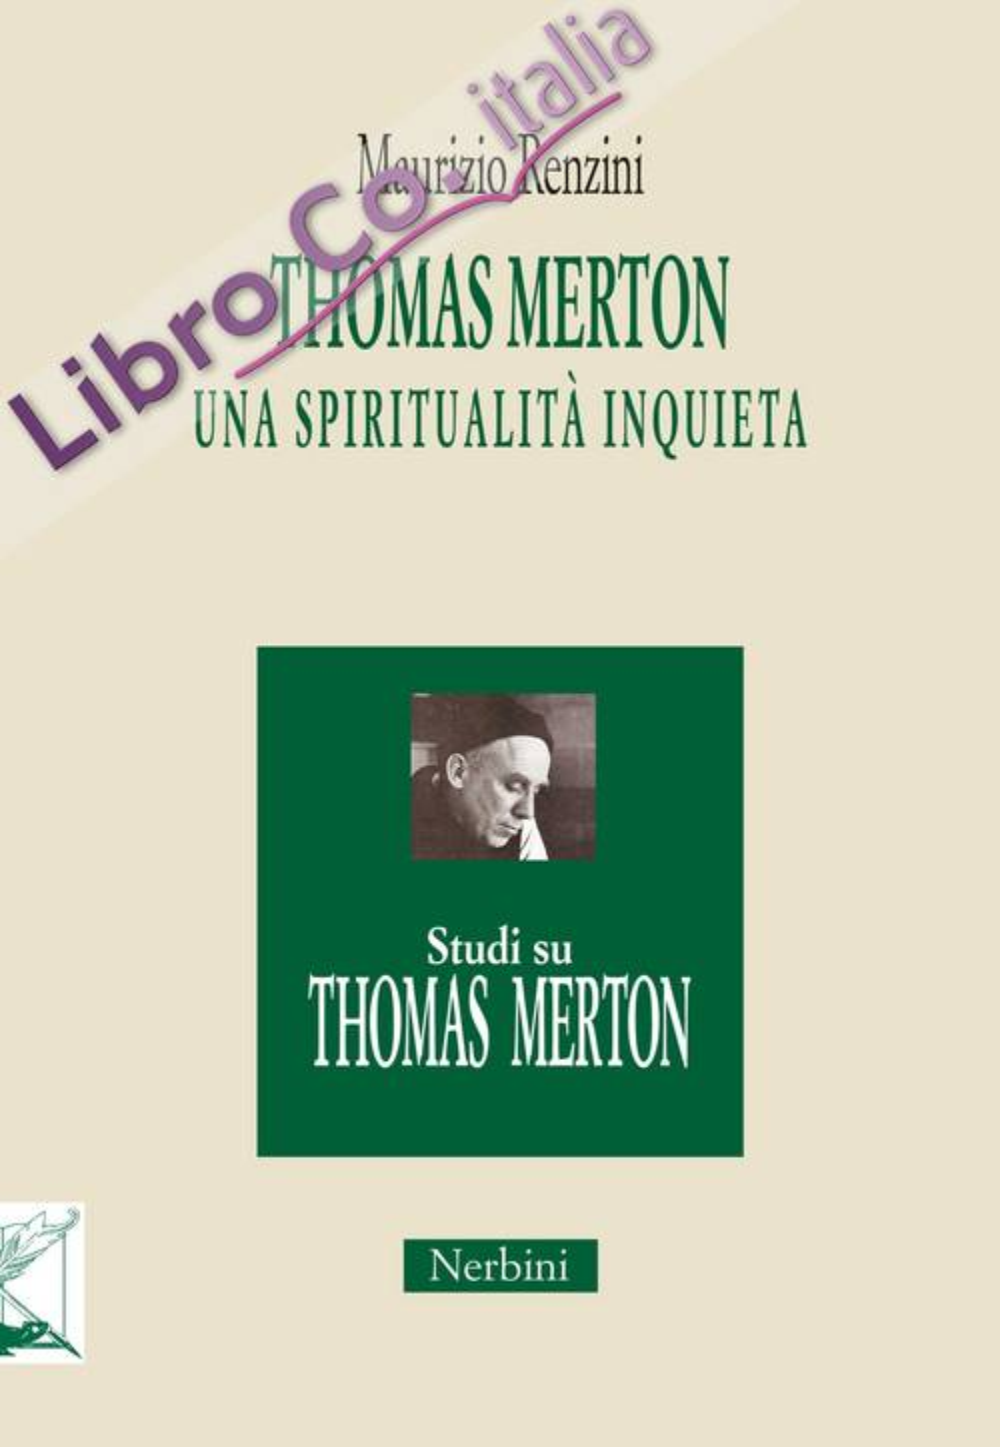 Thomas Merton: una spiritualità inquieta